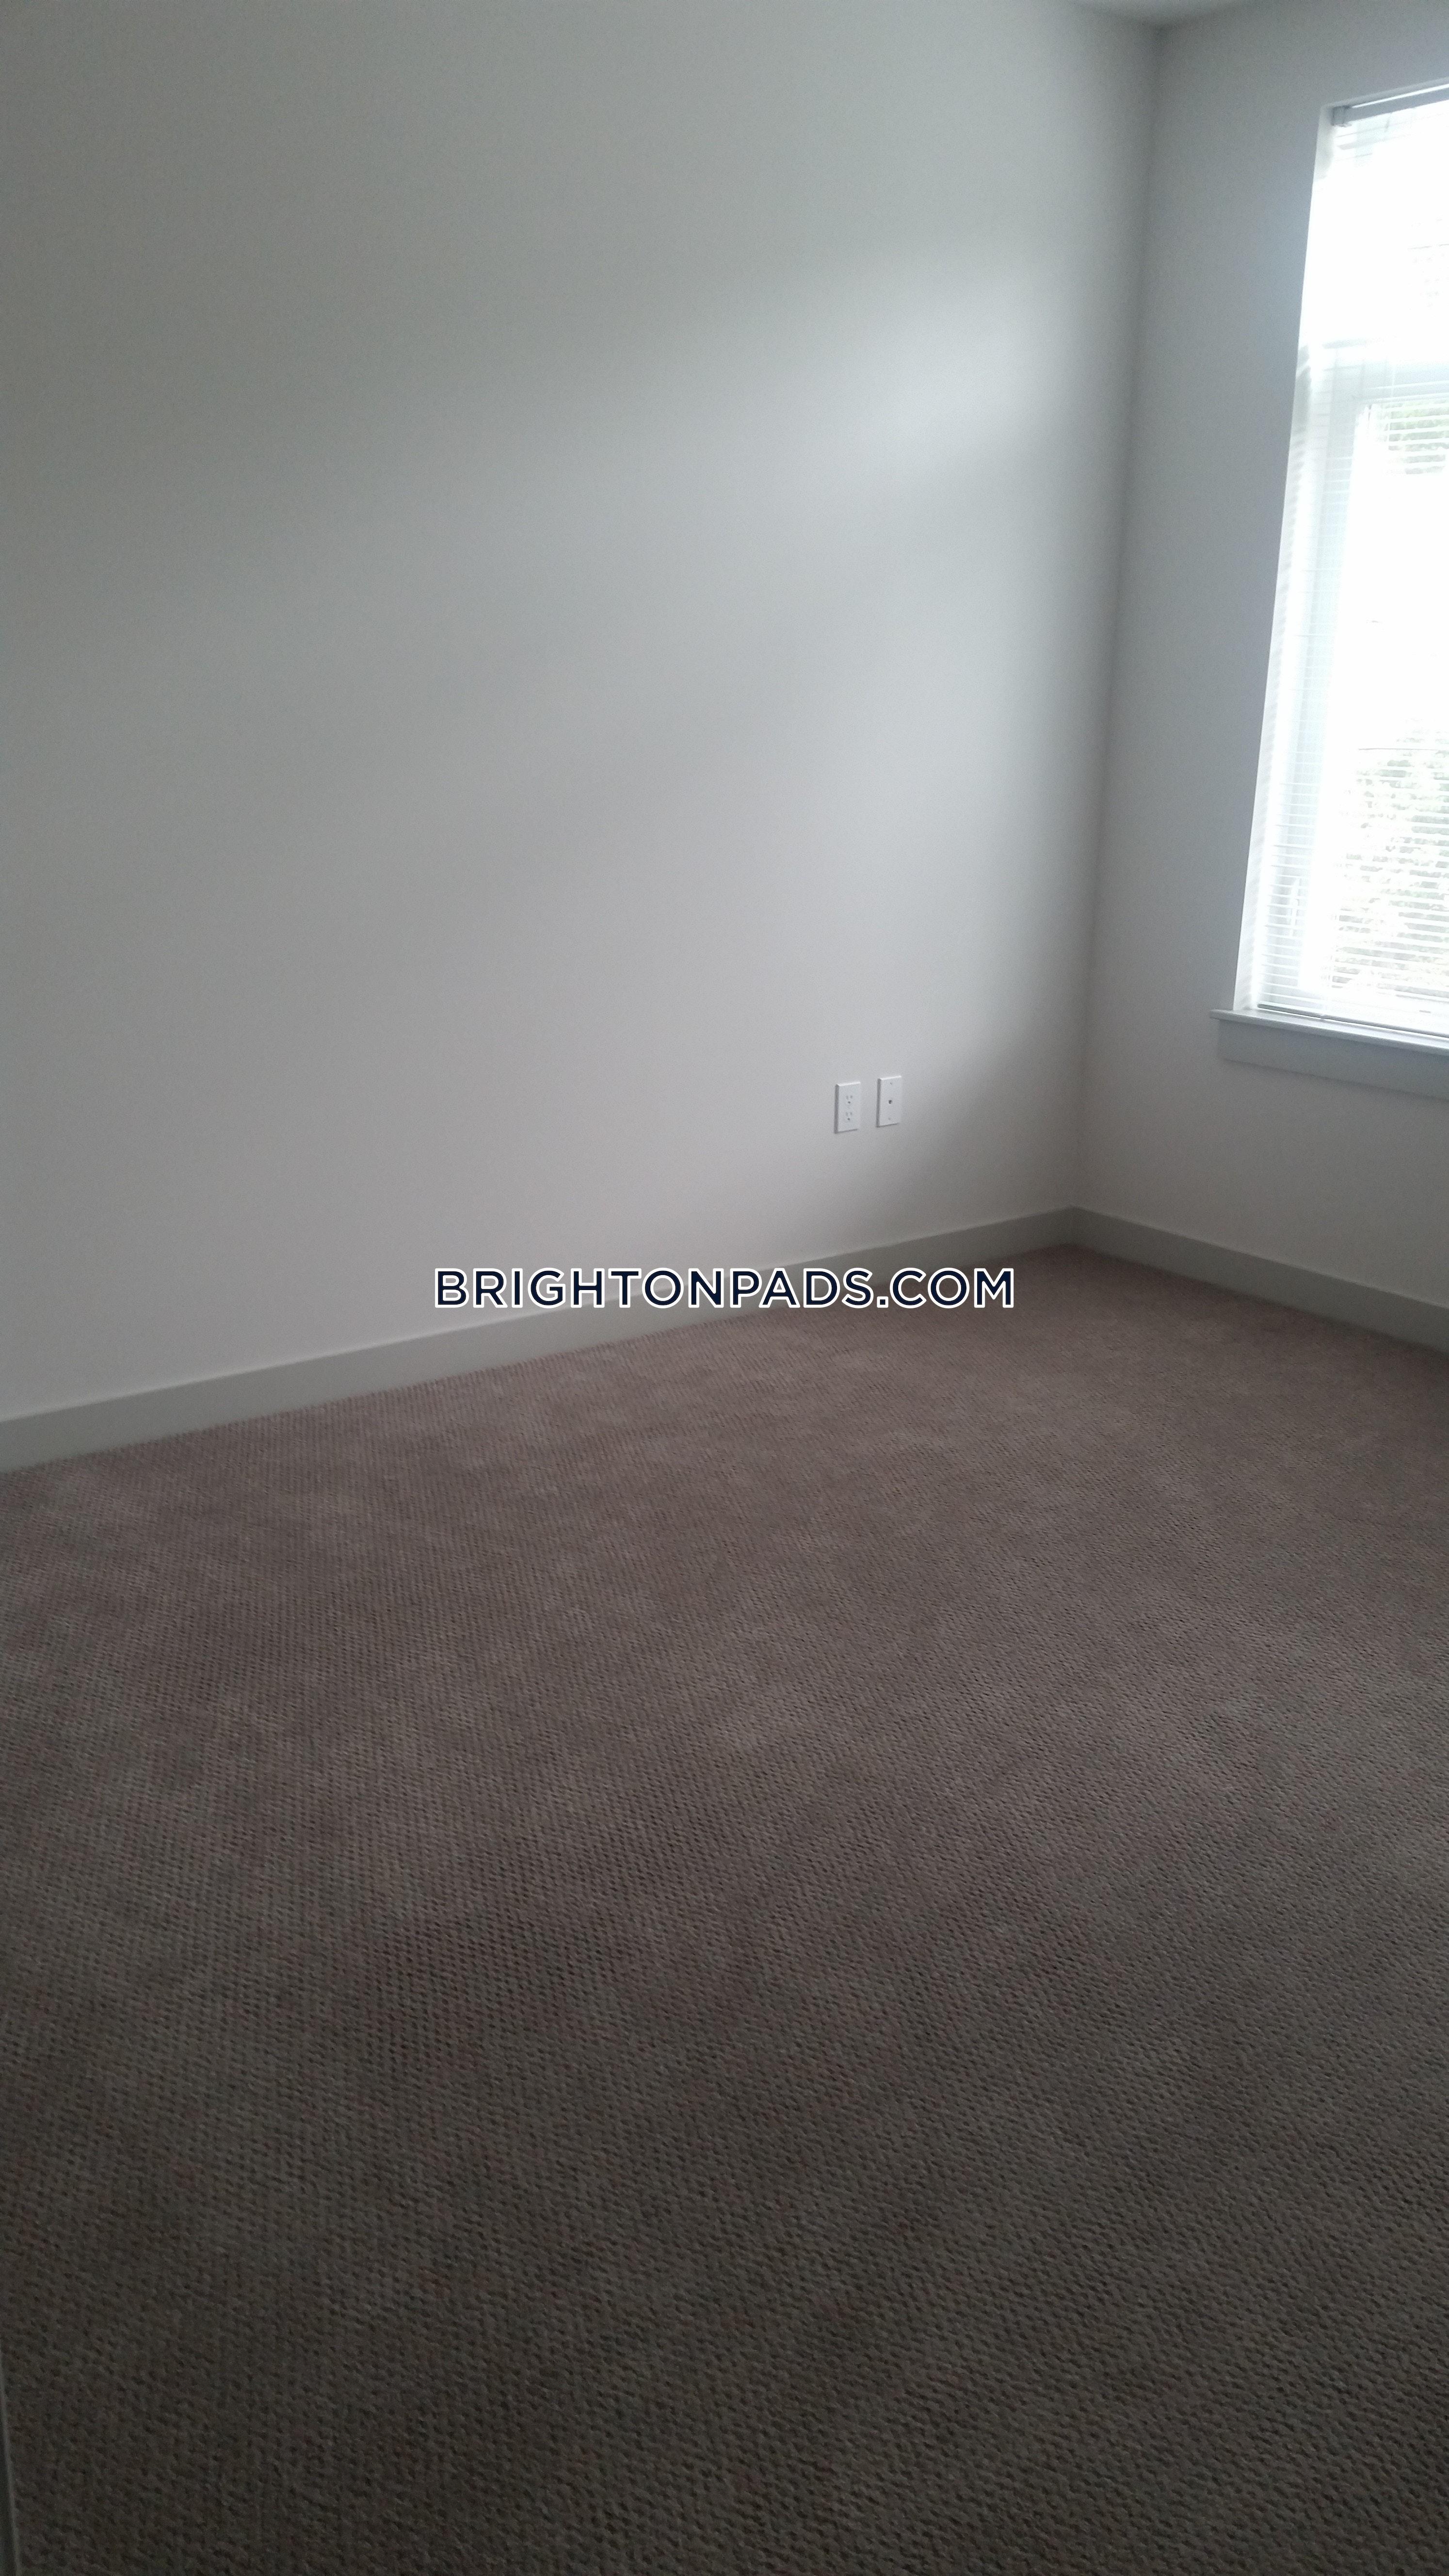 2-beds-2-baths-boston-brighton-oak-square-3775-386637